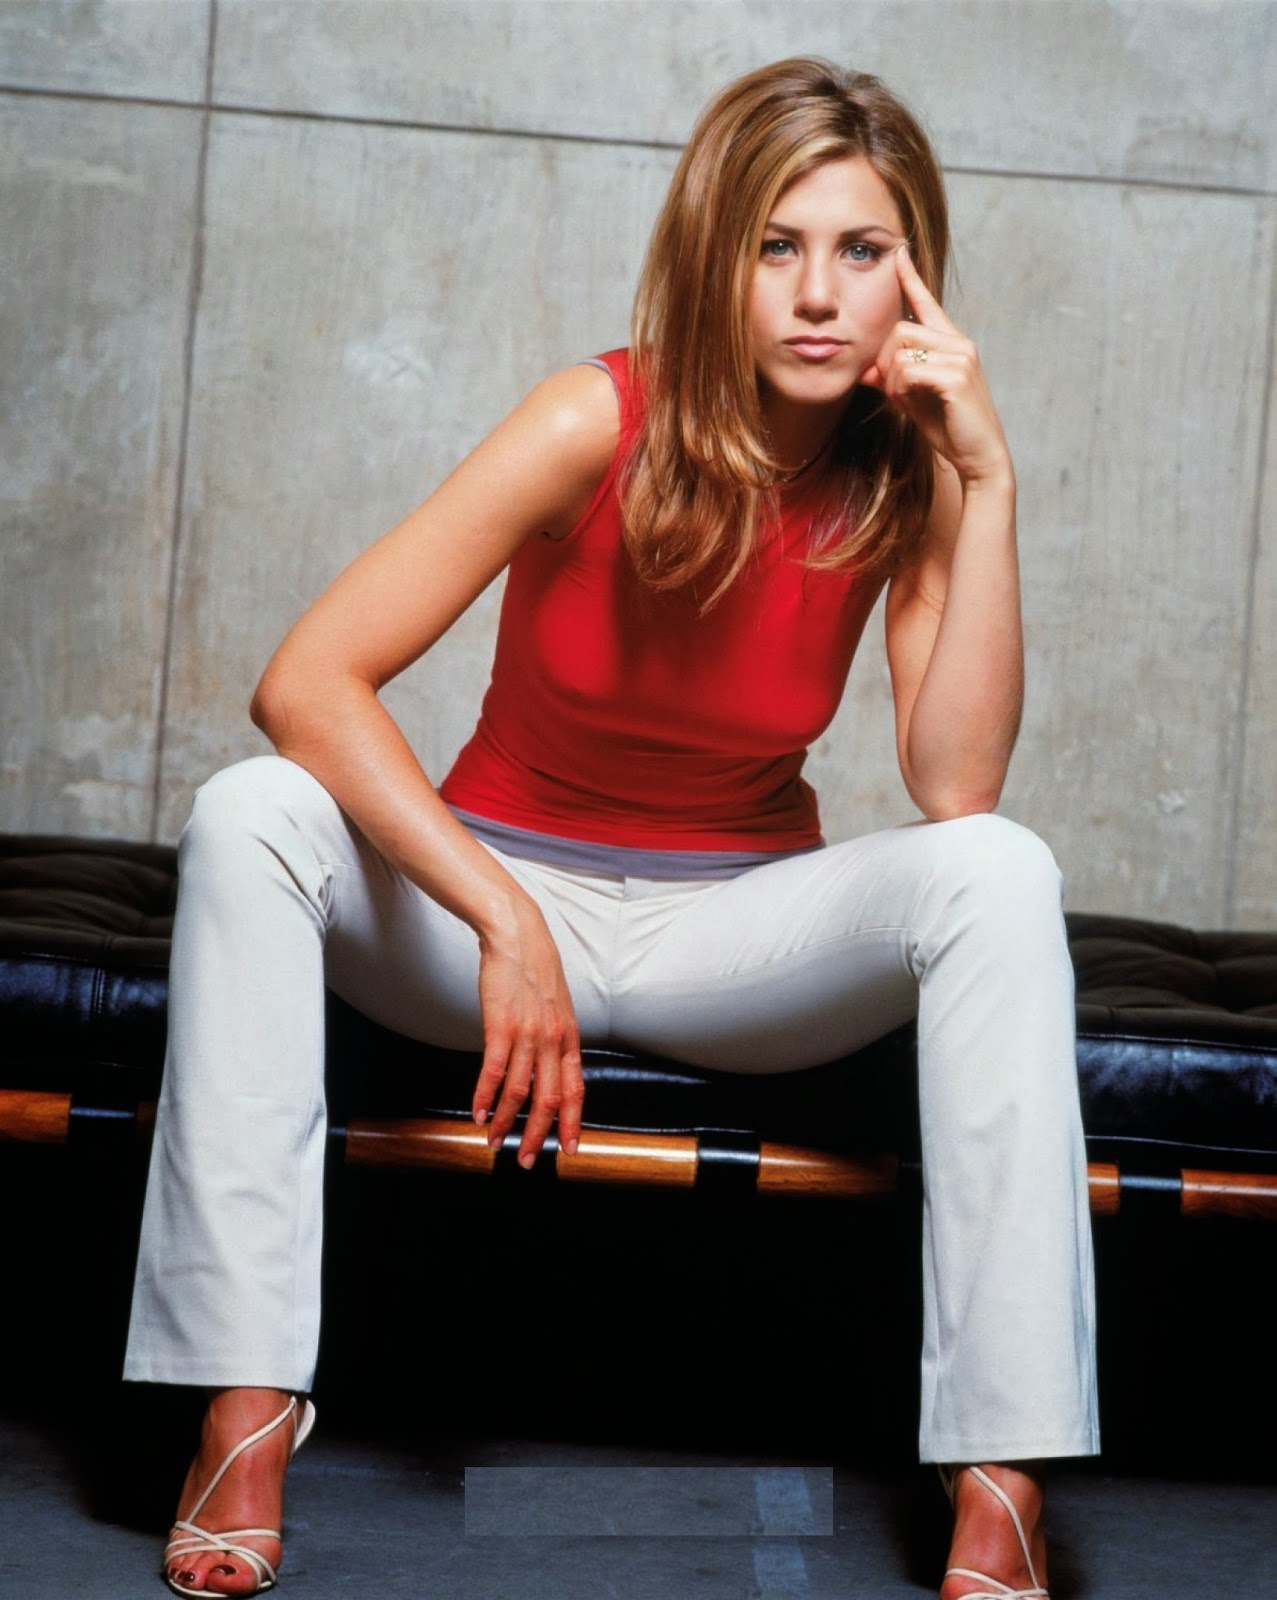 Dyanmic Wallpapers Jennifer Aniston Hot Images -6053